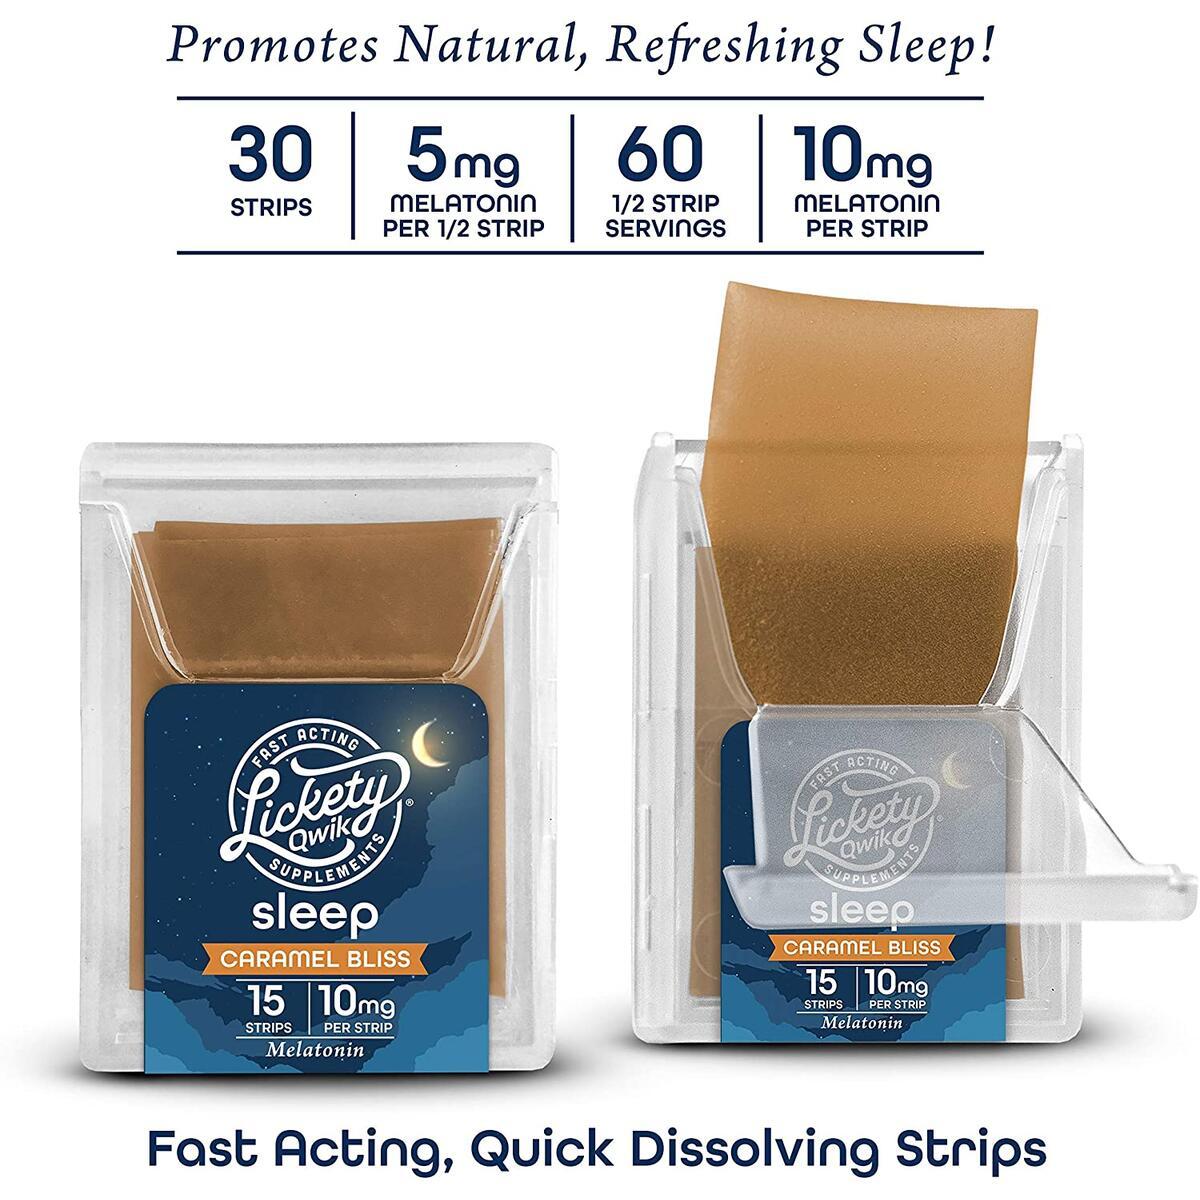 Lickety Qwik Melatonin Sleep Strips